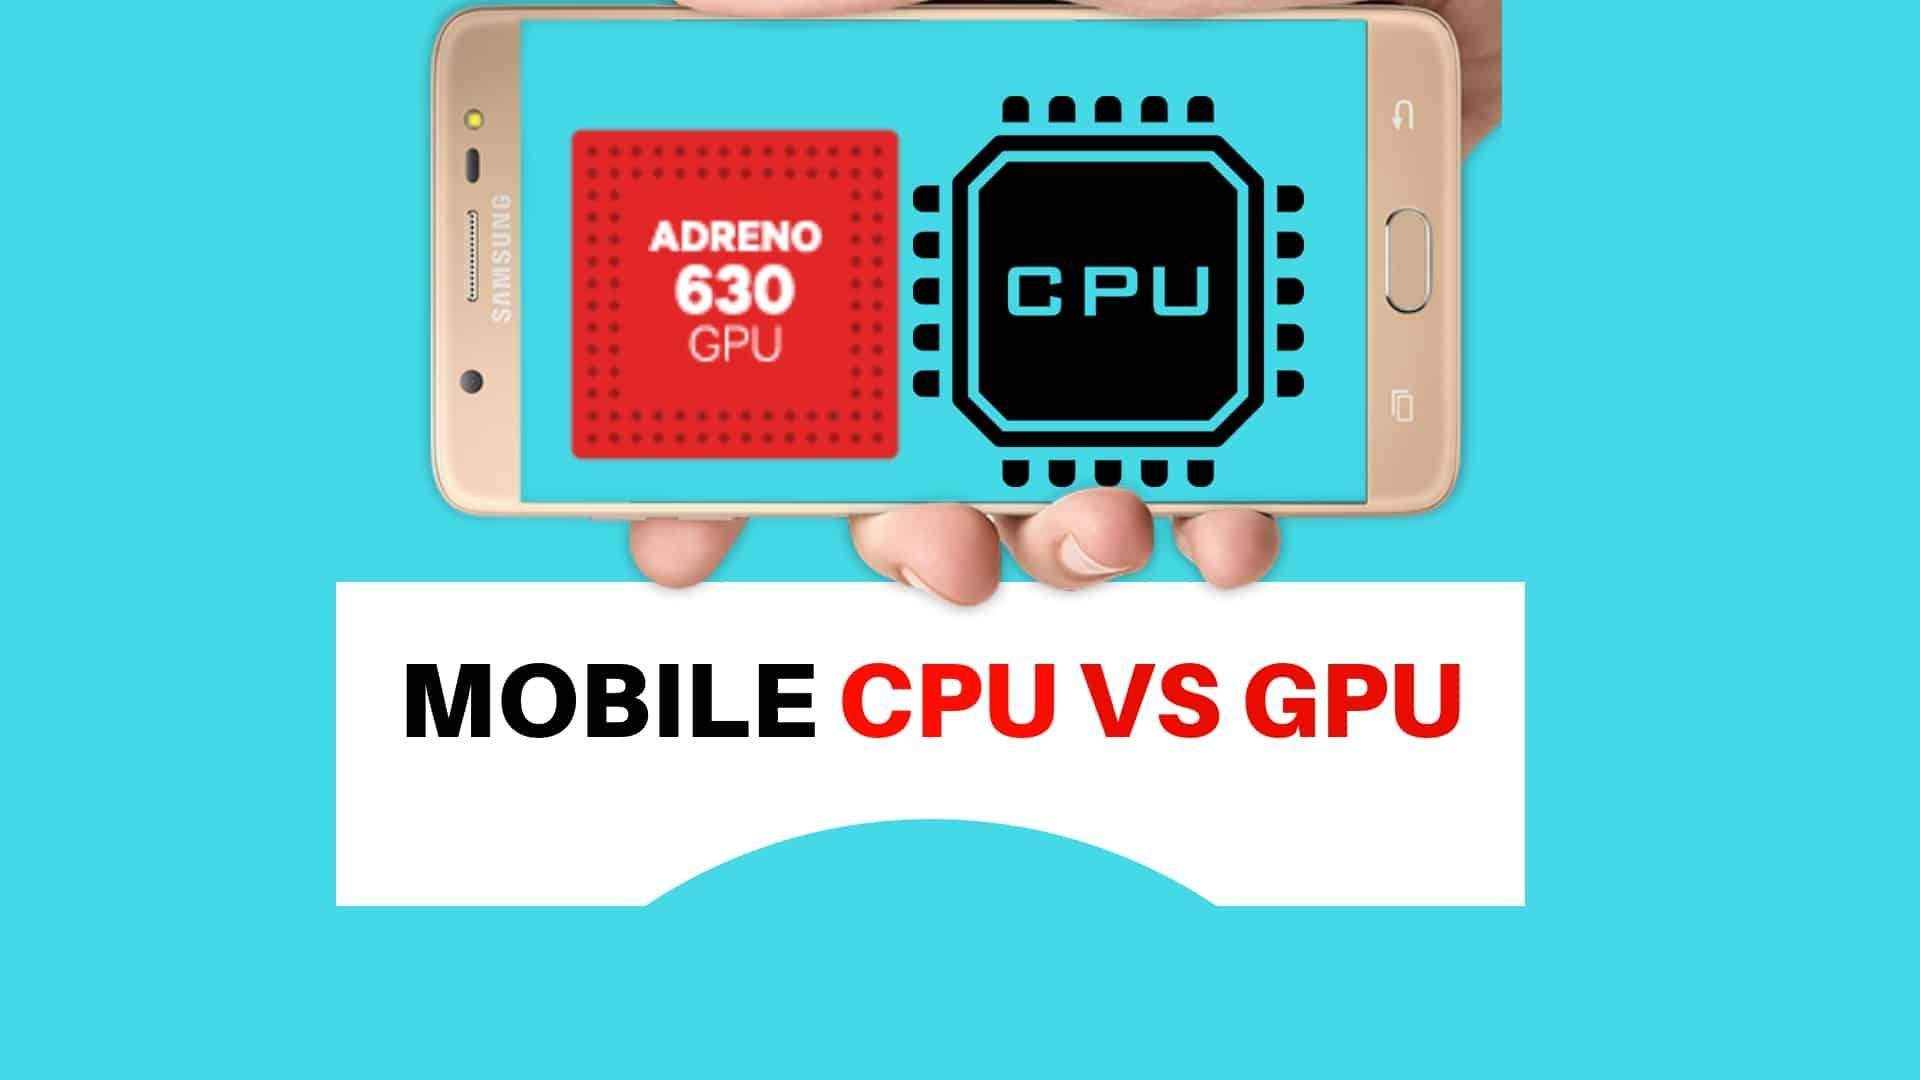 MOBILE CPU VS GPU